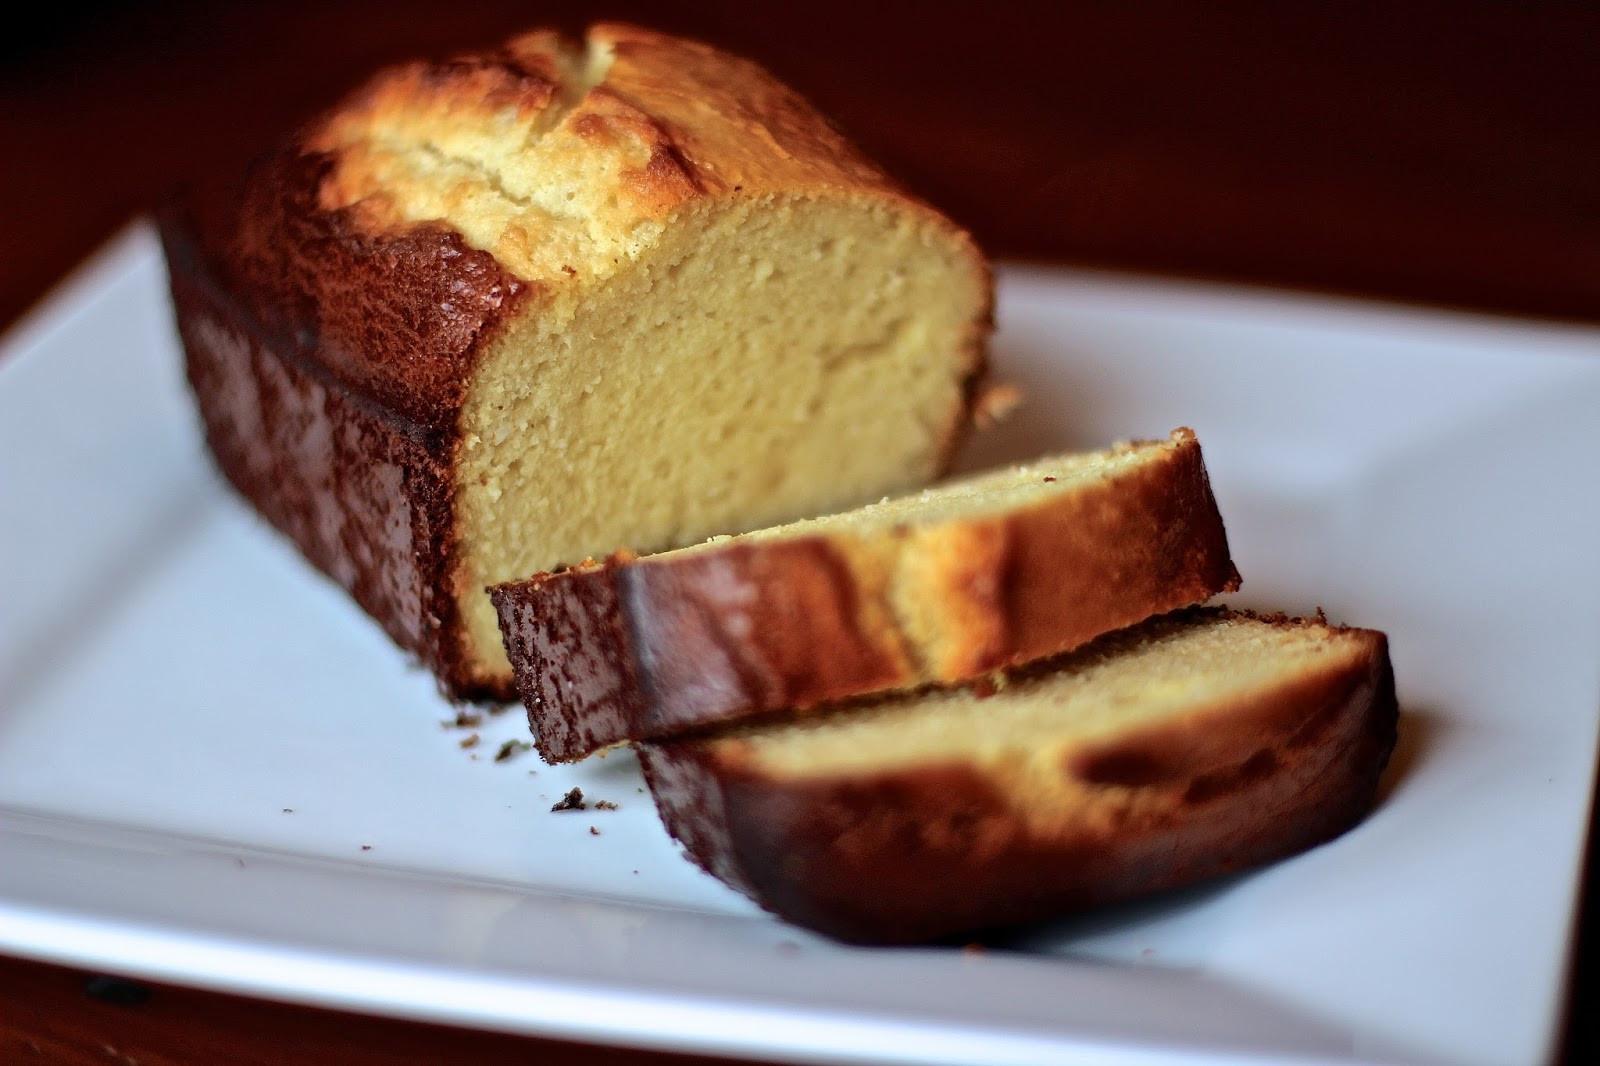 Keto Bread Crumbs Almond Flour  Grain Free Keto Almond Flour Bread DrJockers